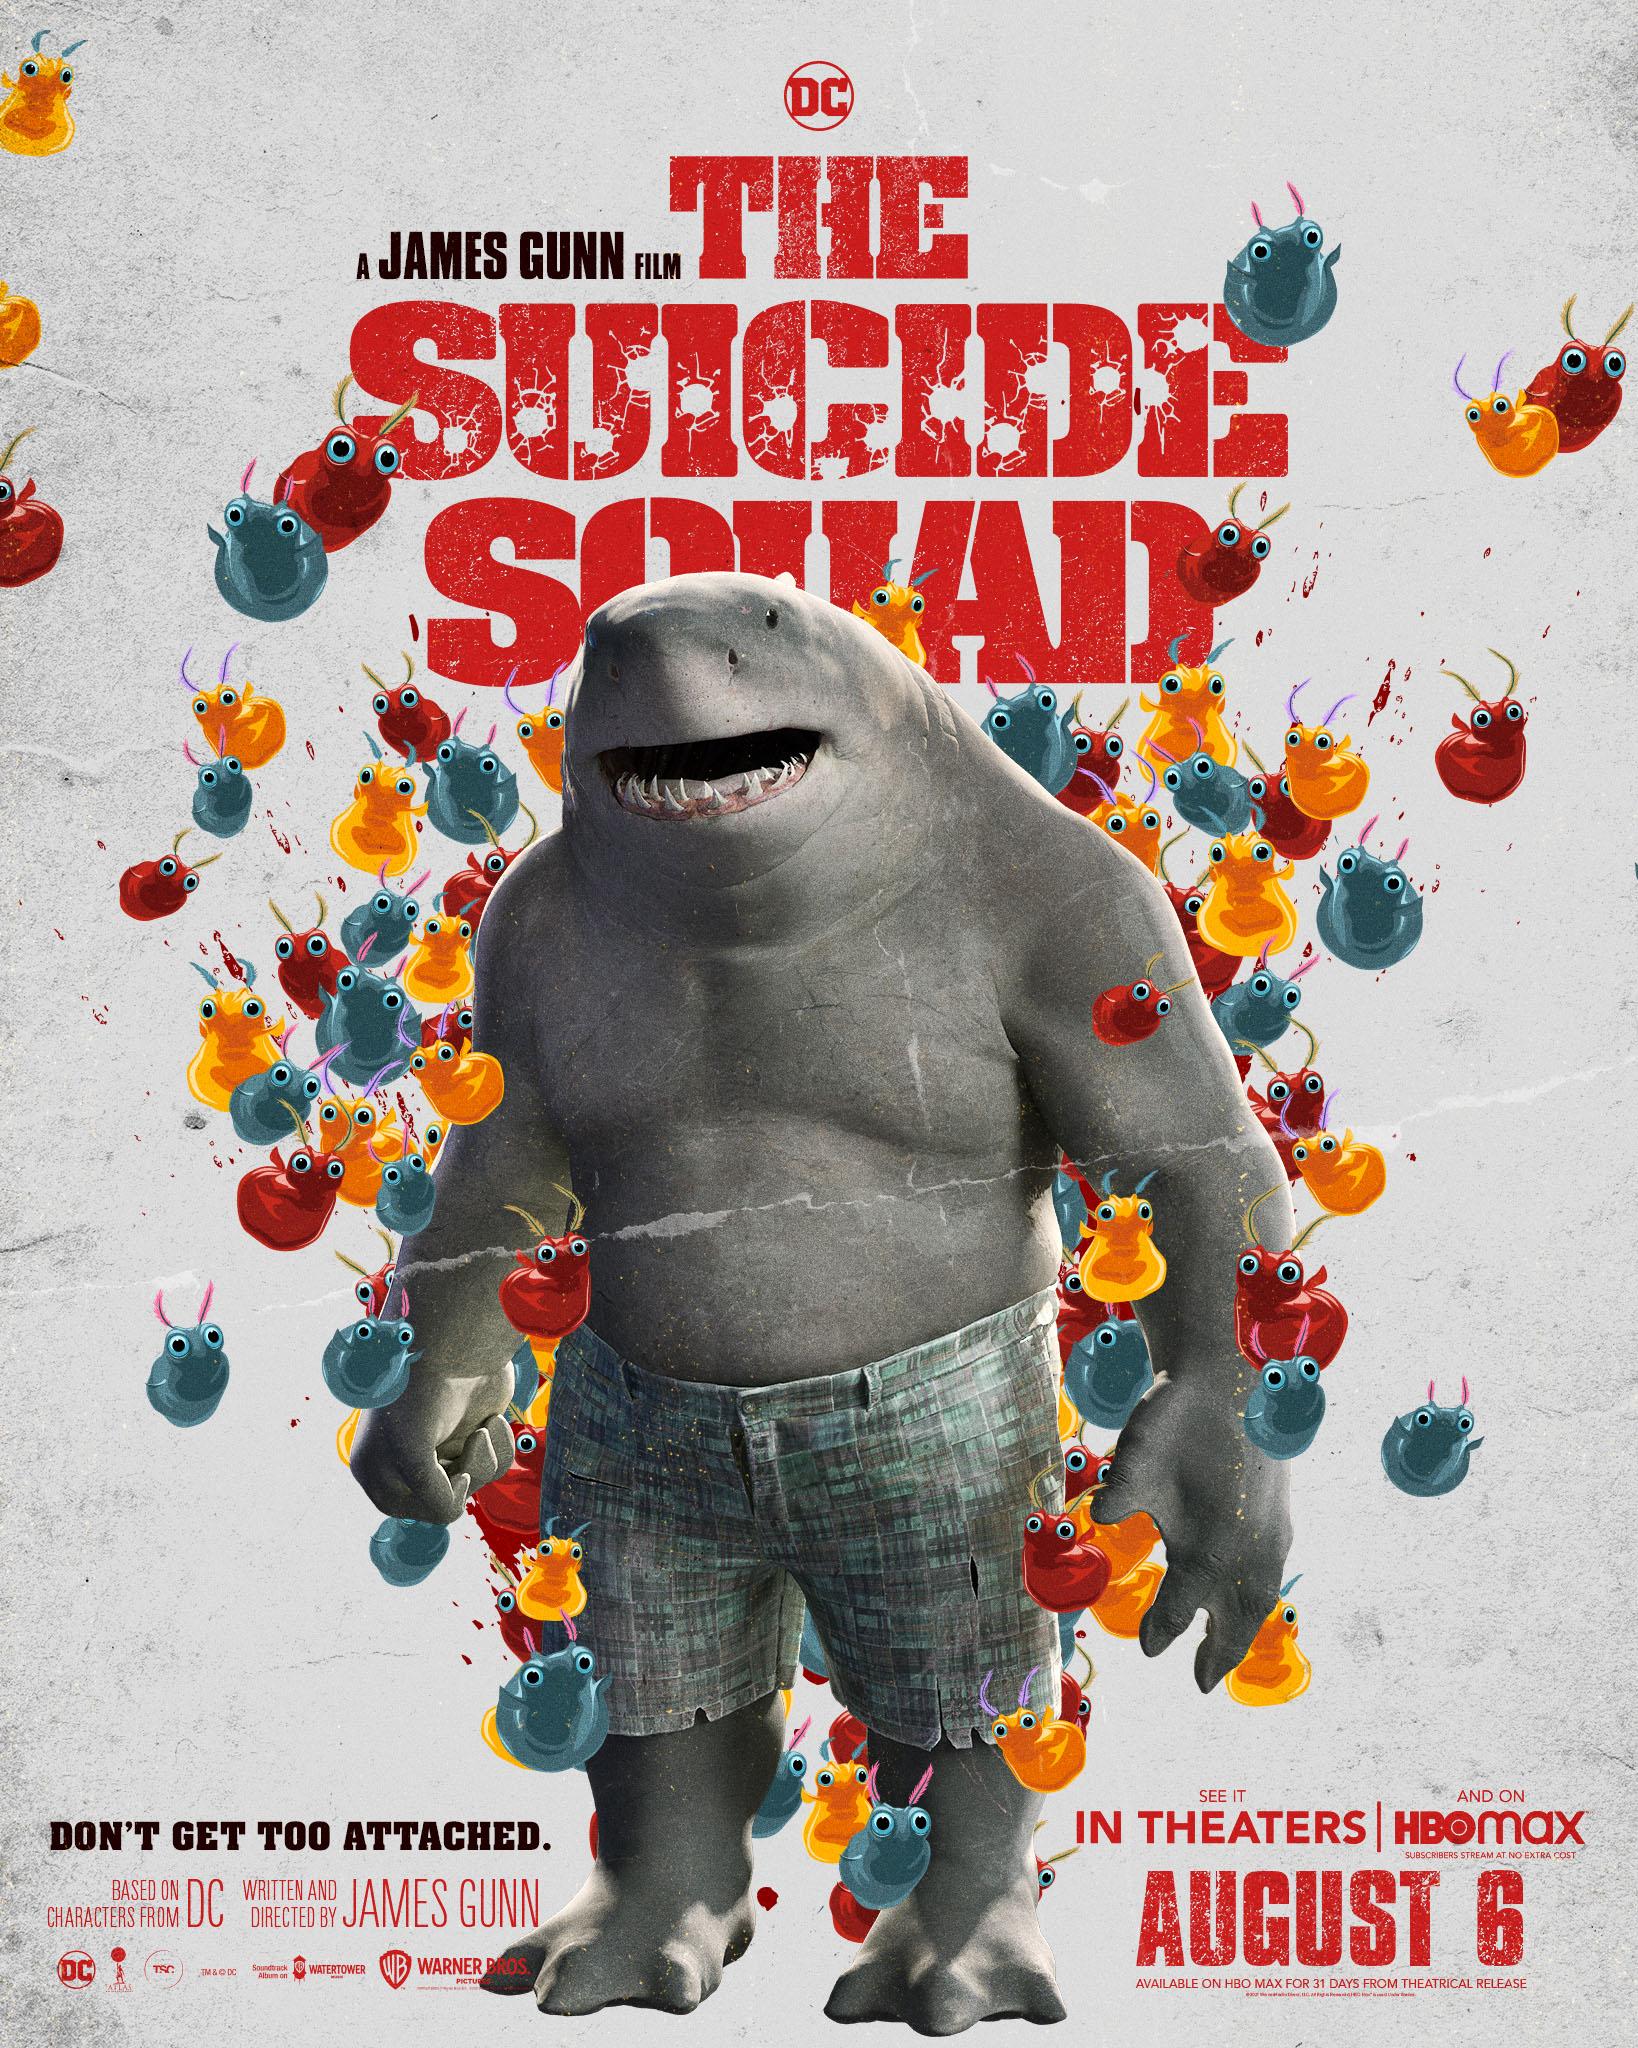 SUISQ2 Character Art King Shark INSTAVERT 1638X2048 DOM min